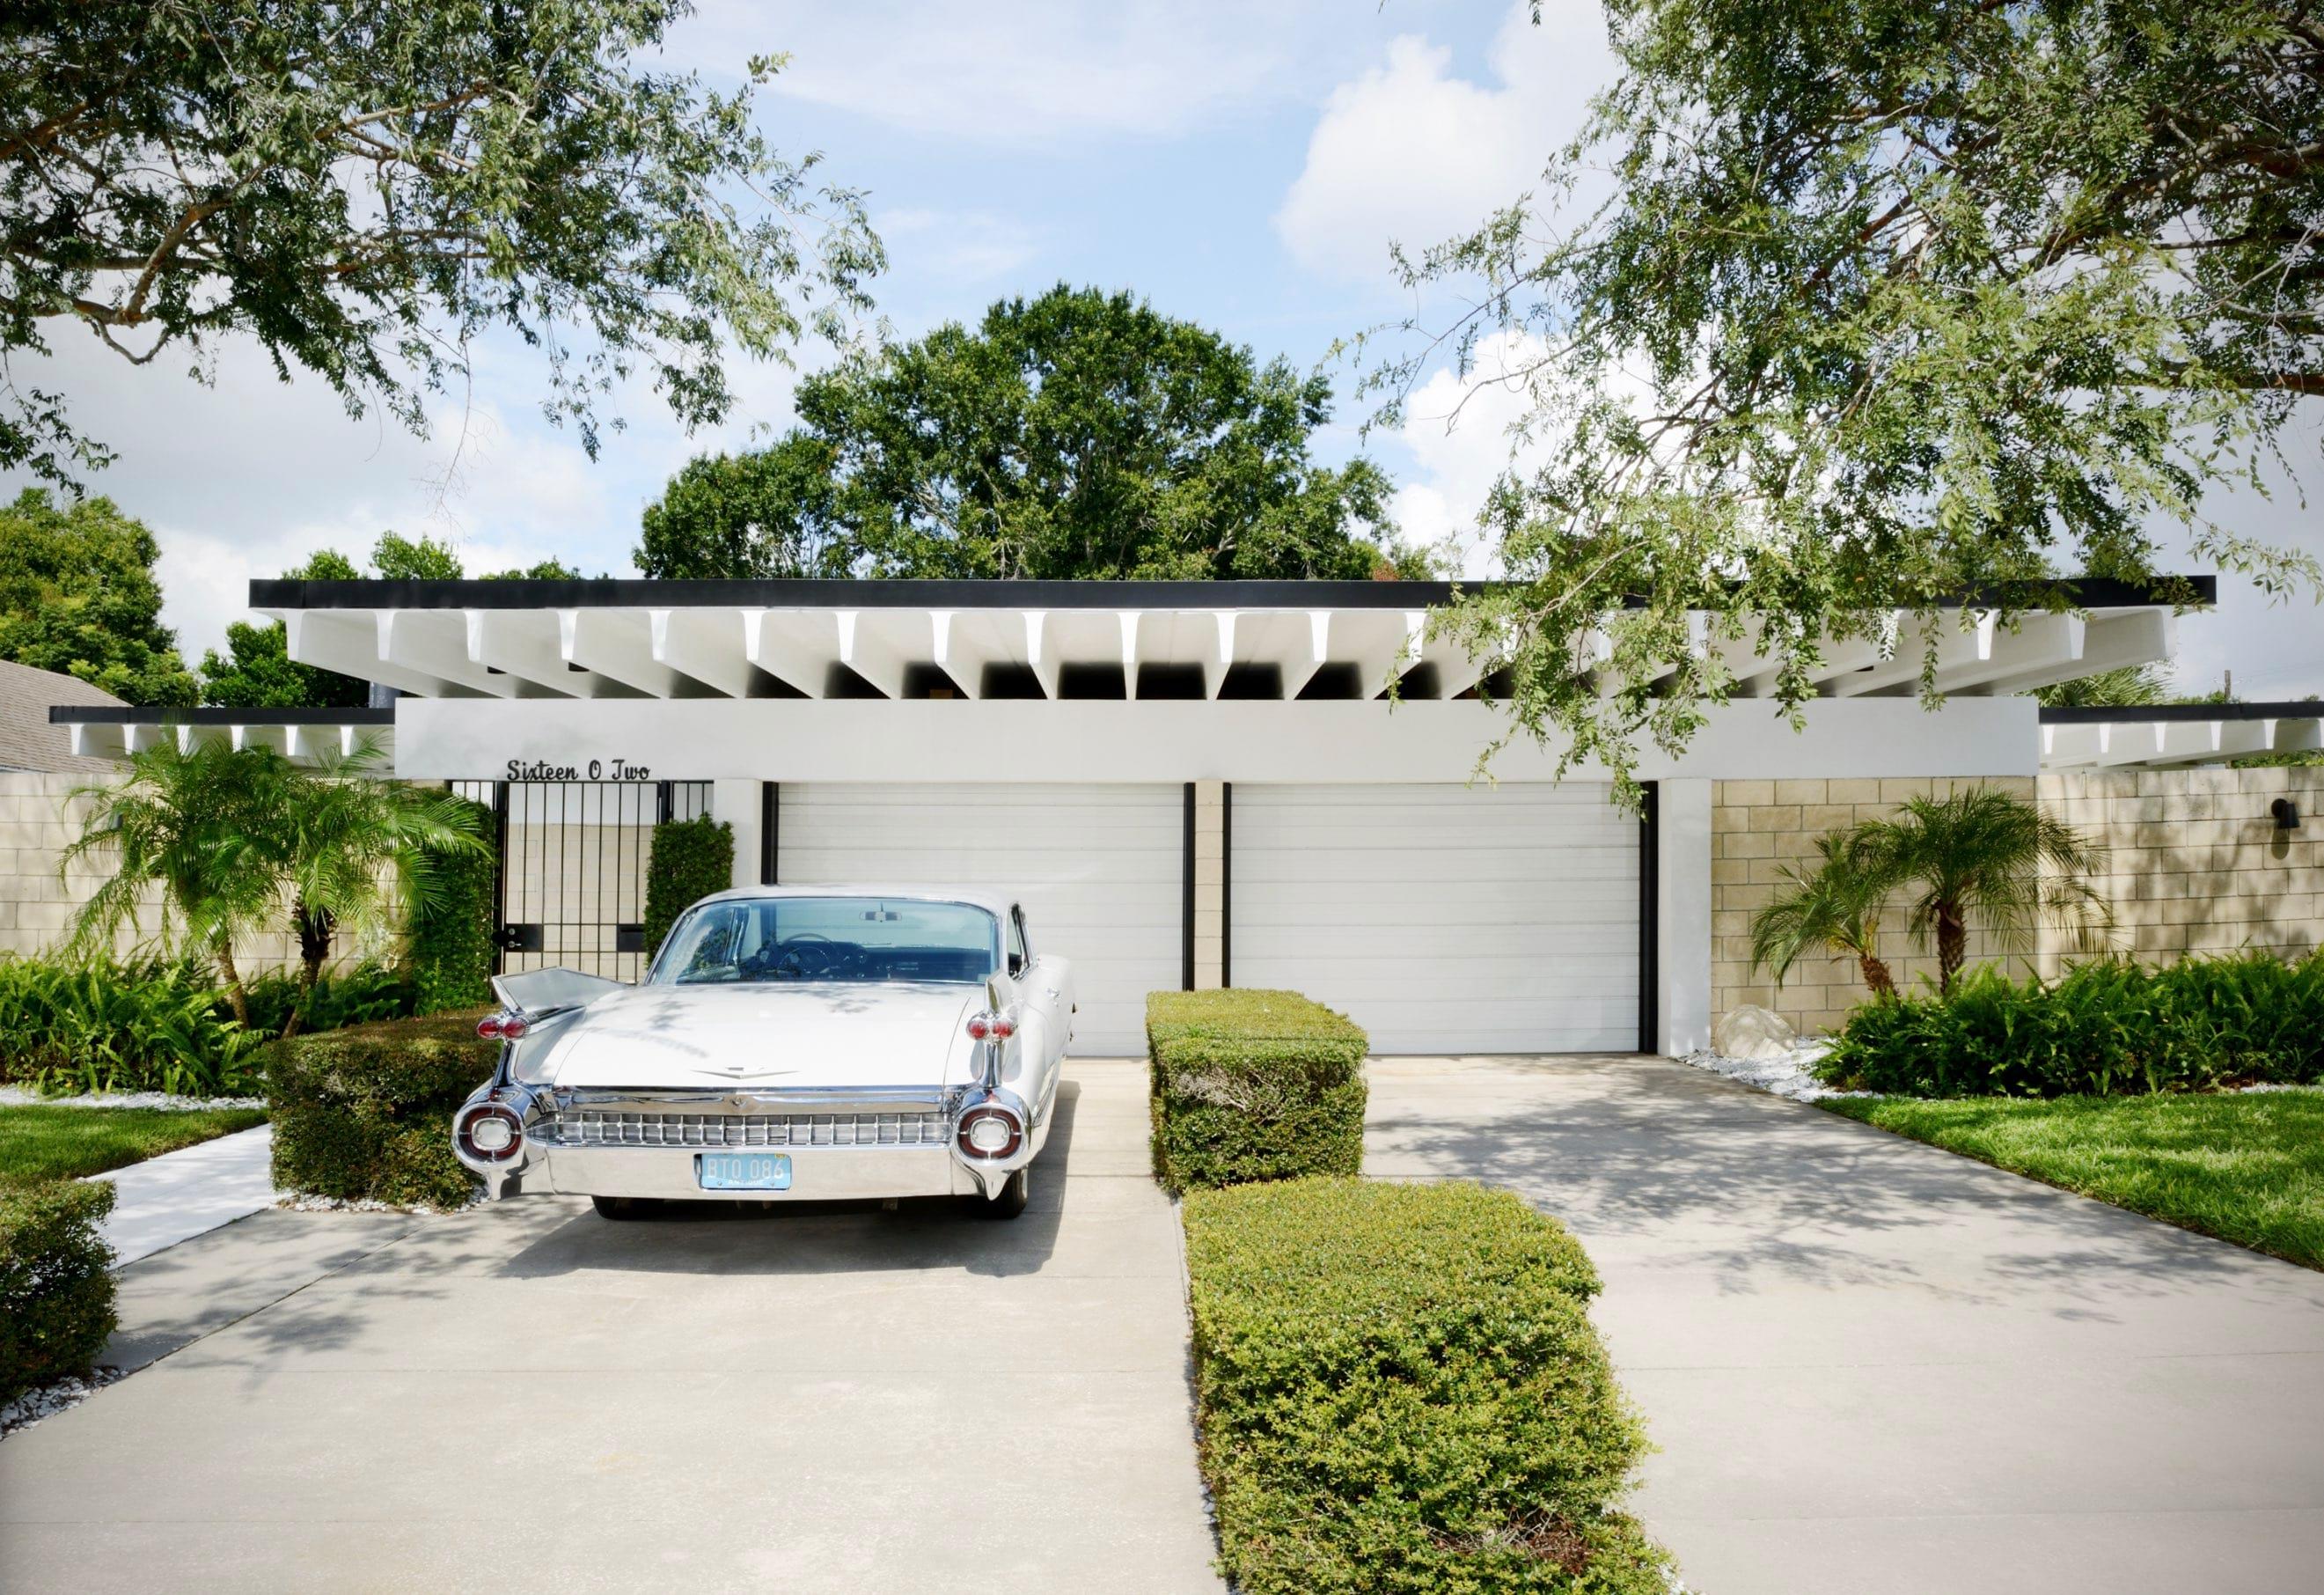 Christopher florentino - midcentury home Florida - exterior Cadillac